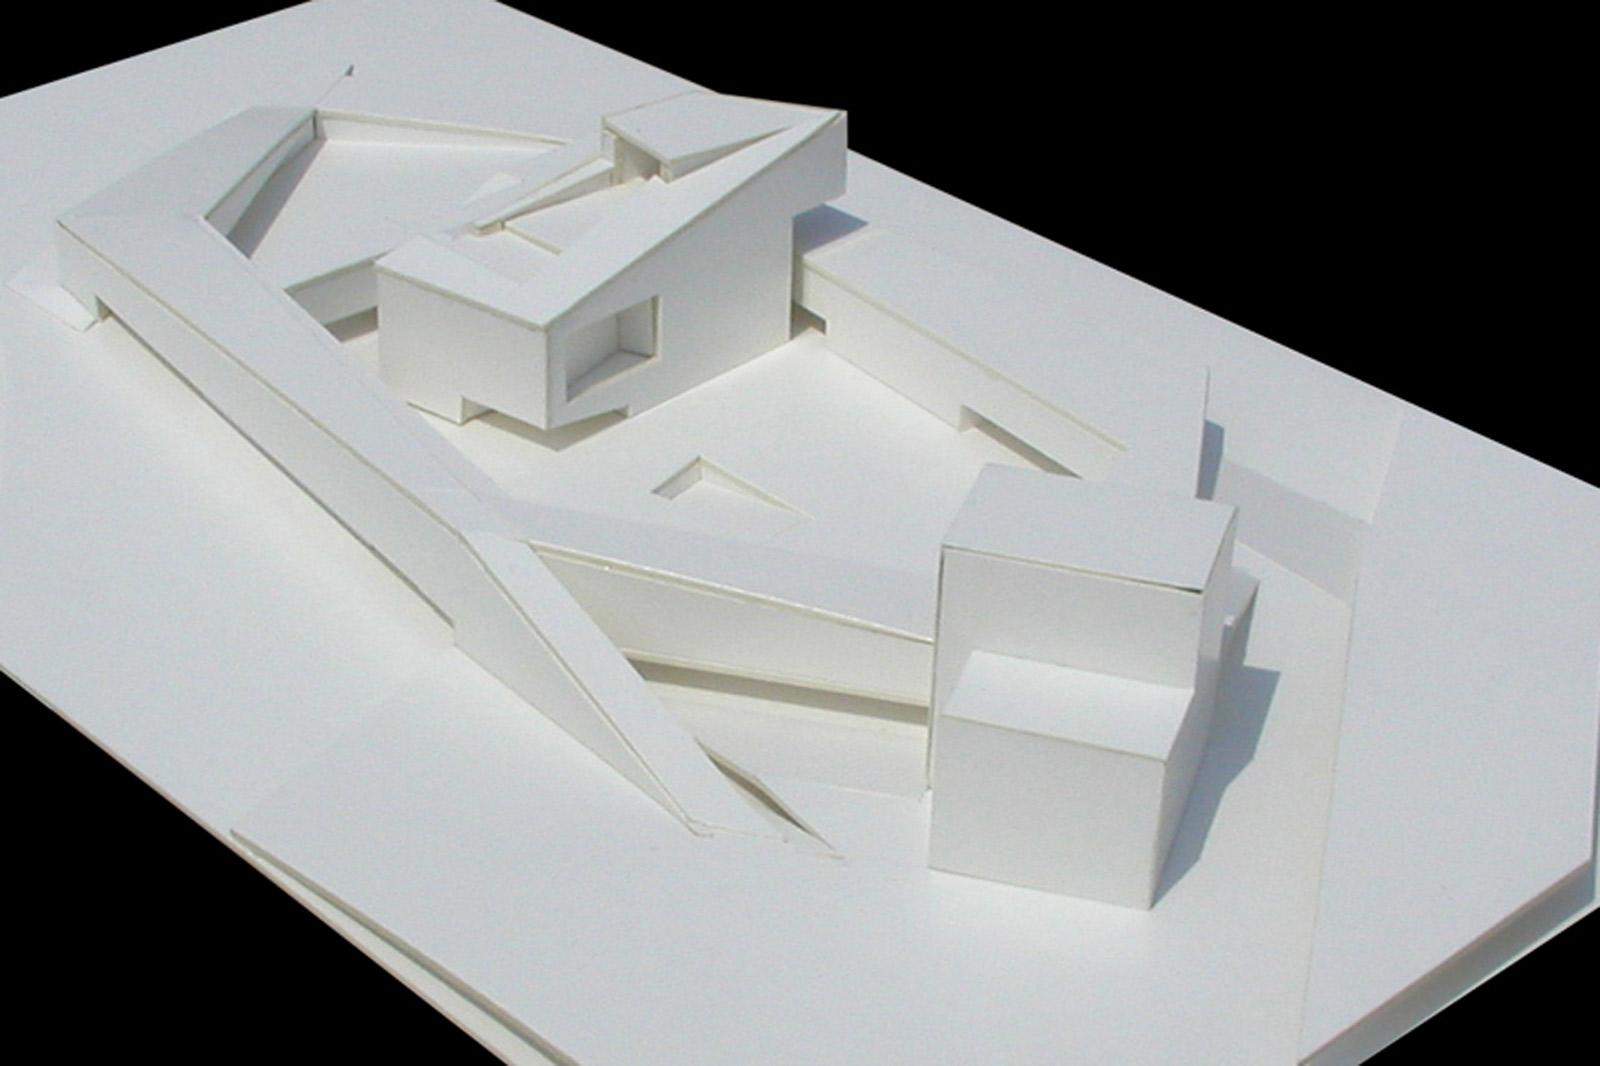 3-Europan7-model-perspective1.jpg